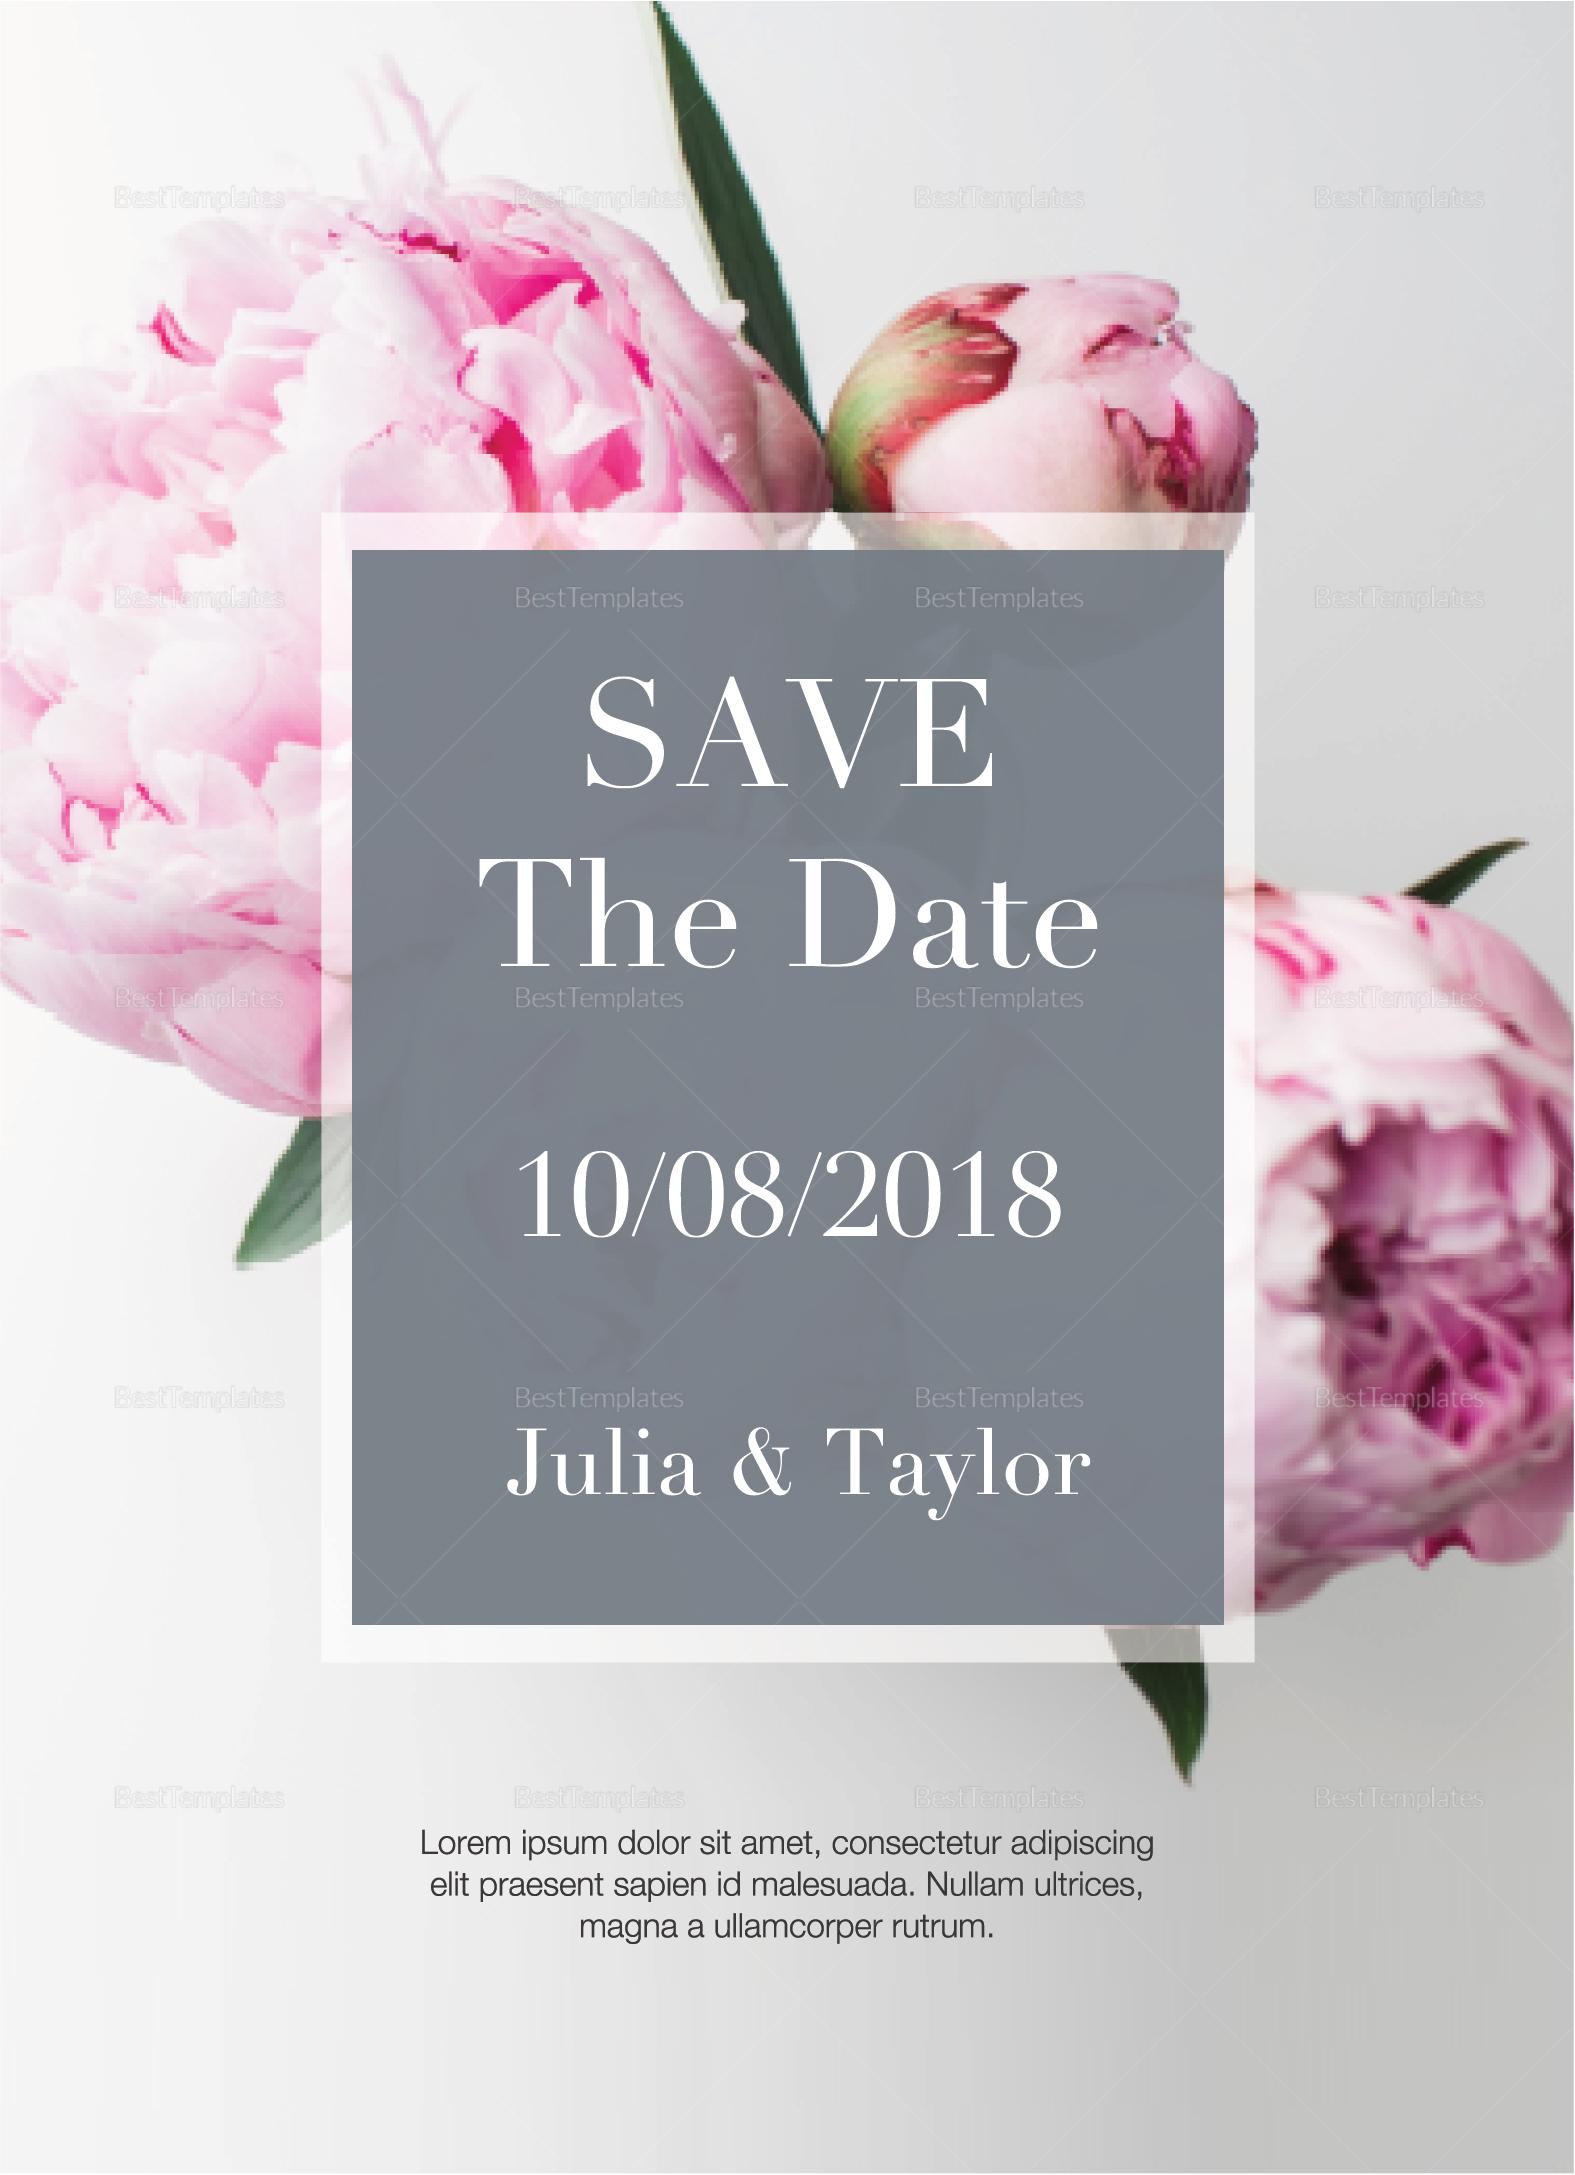 Peony Wedding Invitation Design Template in PSD Word